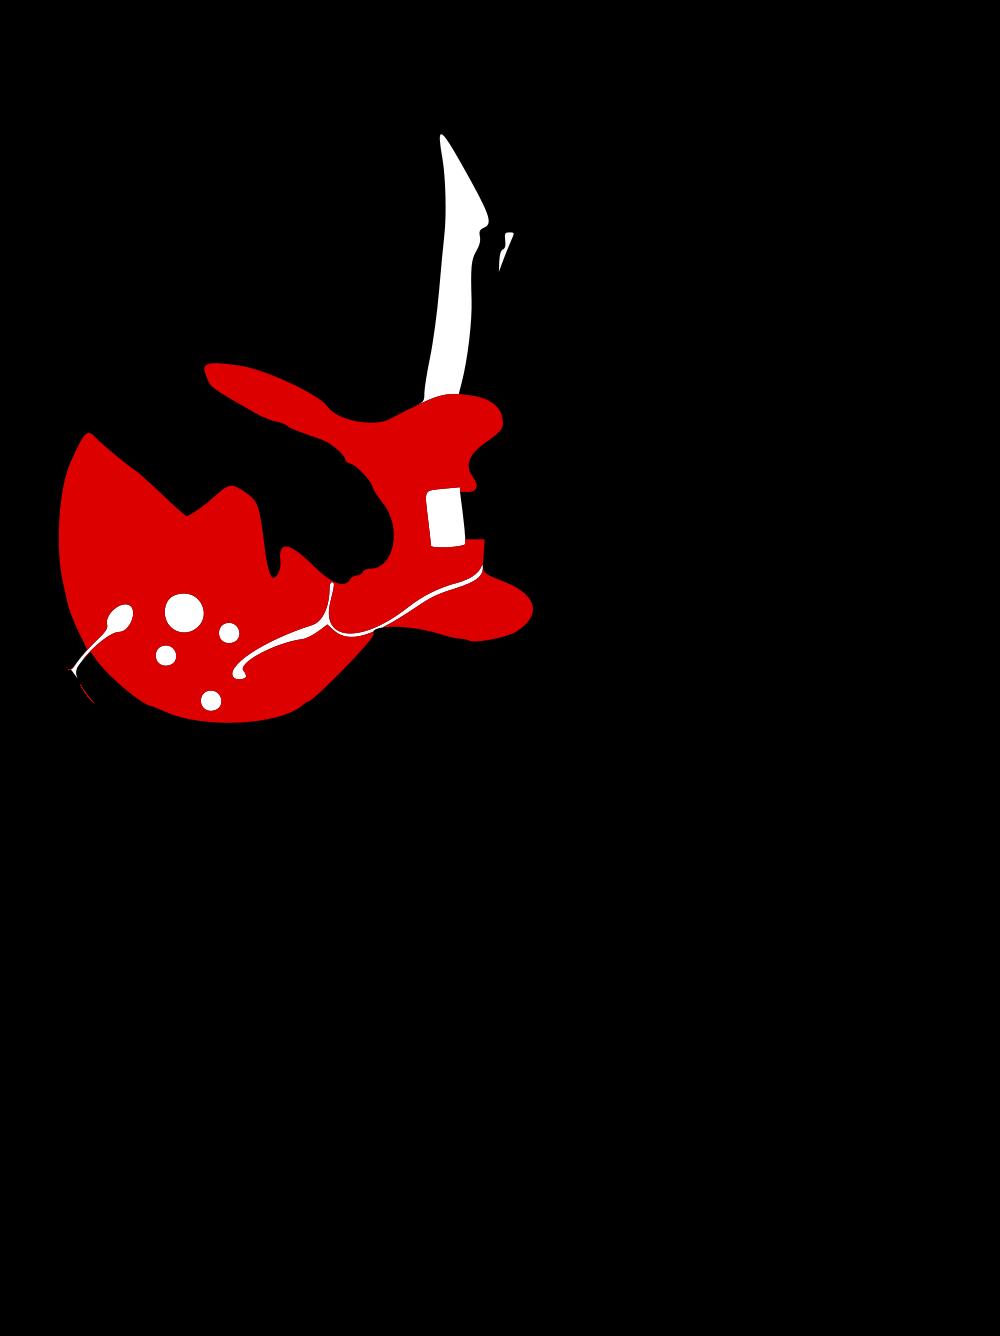 File rocknrollguitarist svg wikimedia. Music clipart rock